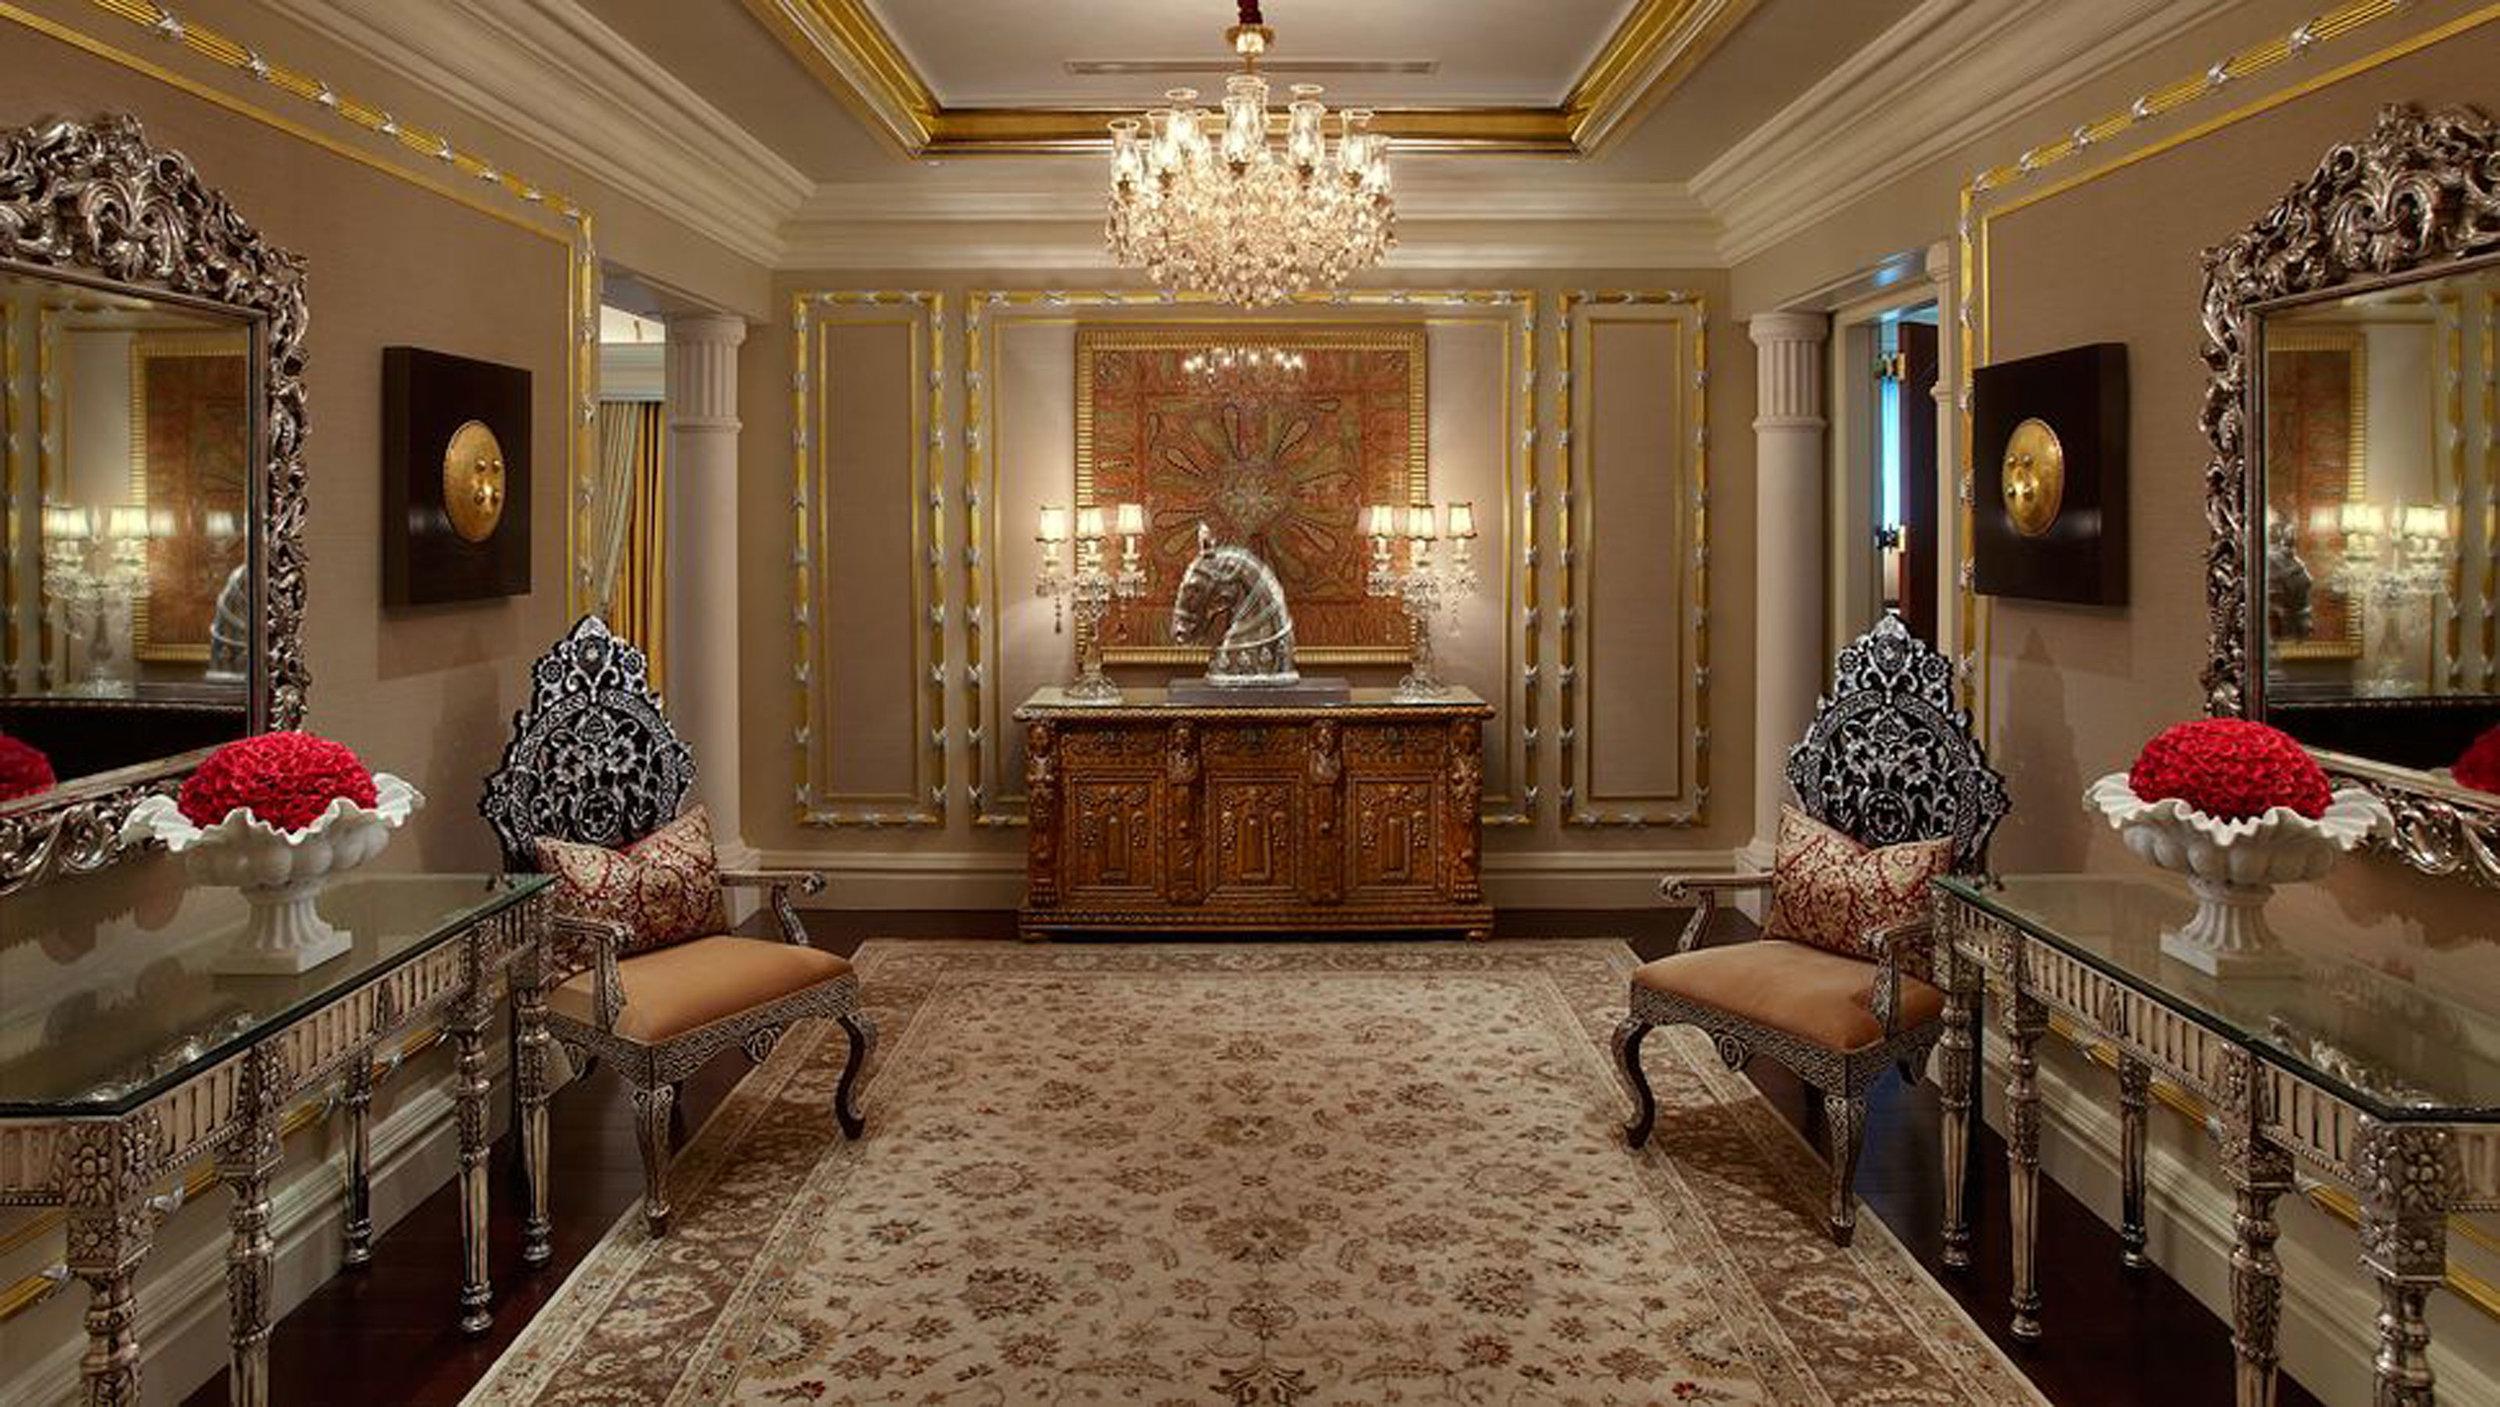 008716-11-maharaja_suite_entrance.jpg